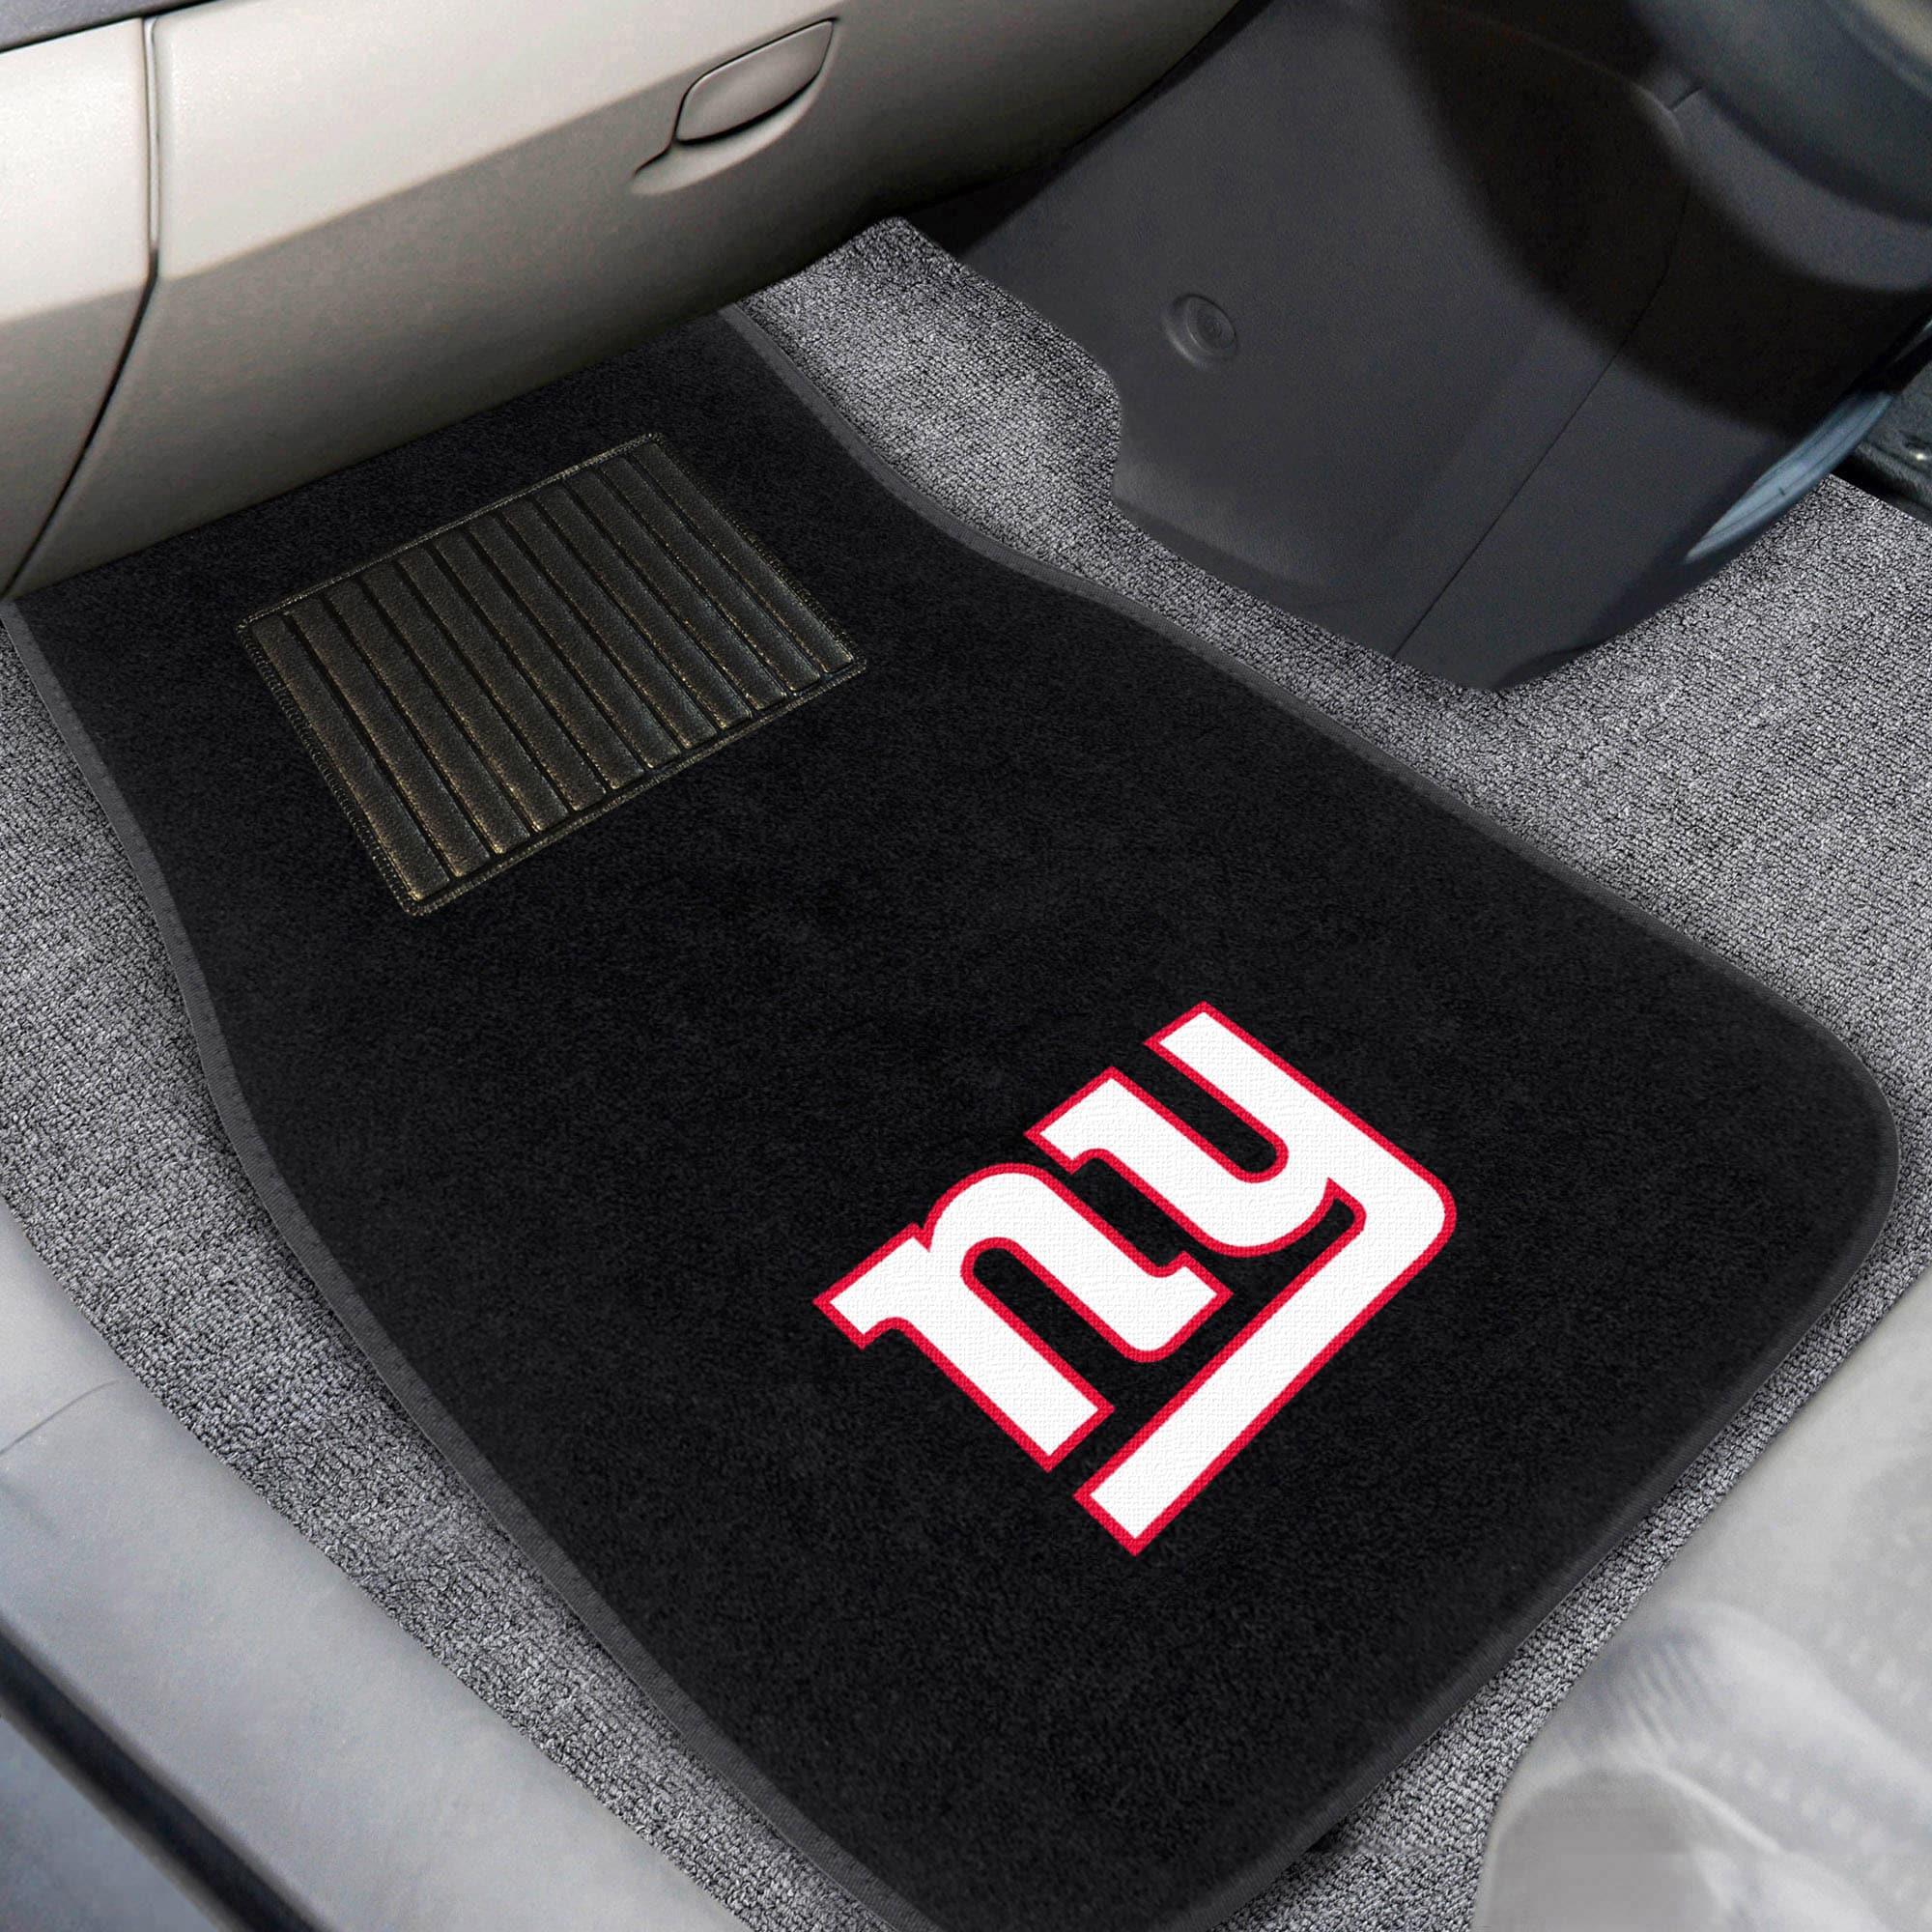 New York Giants 2-Piece Embroidered Car Mat Set